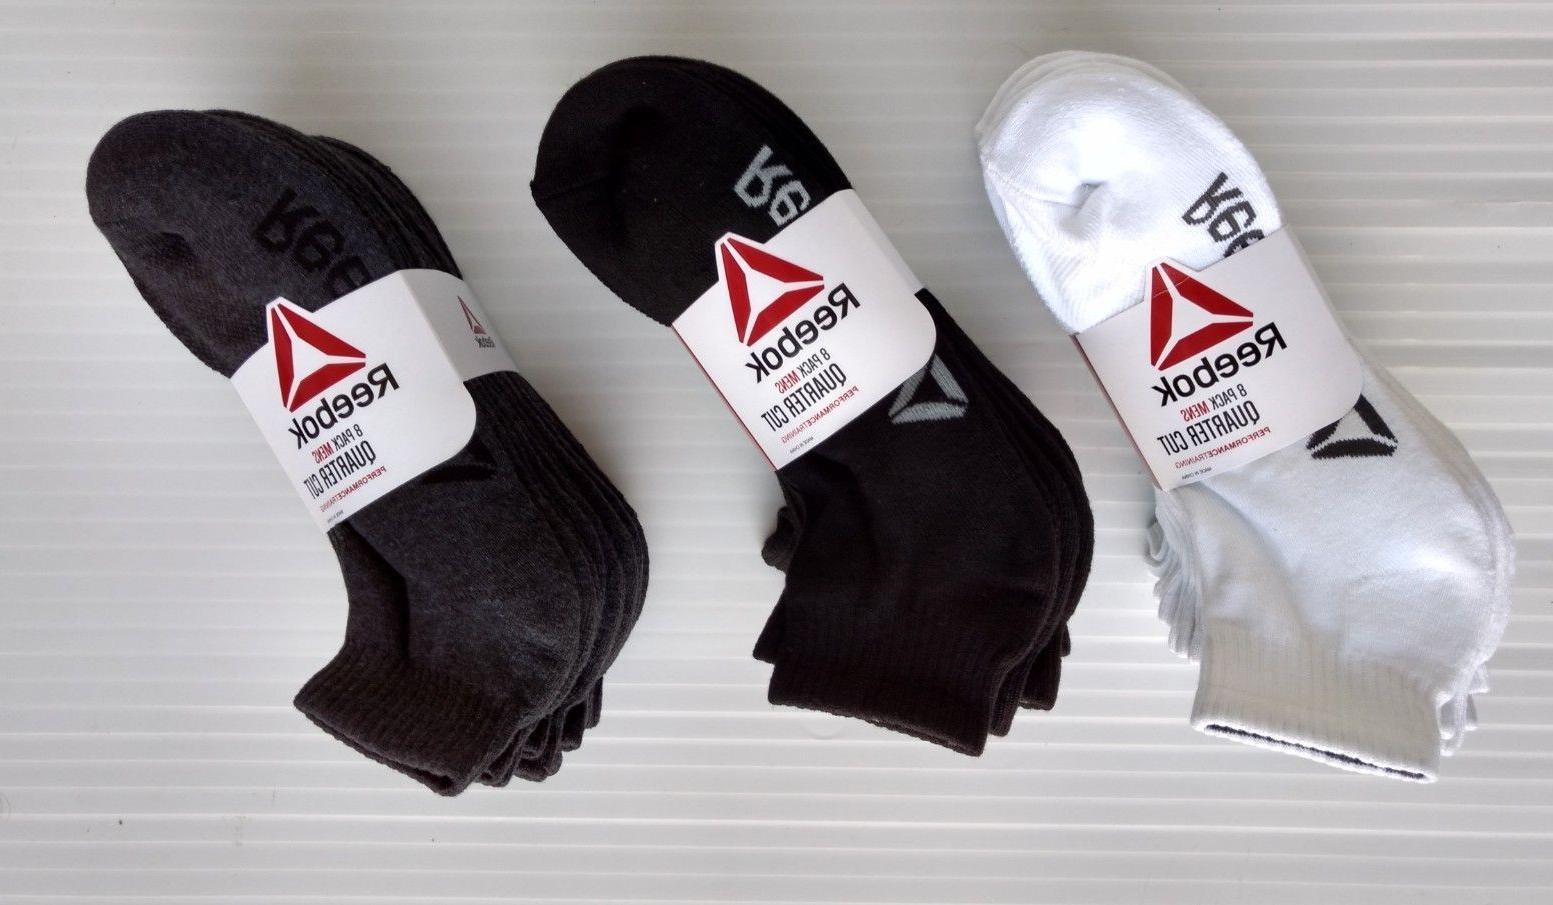 REEBOK Men's Quarter Cut Sport Performance Training Socks -